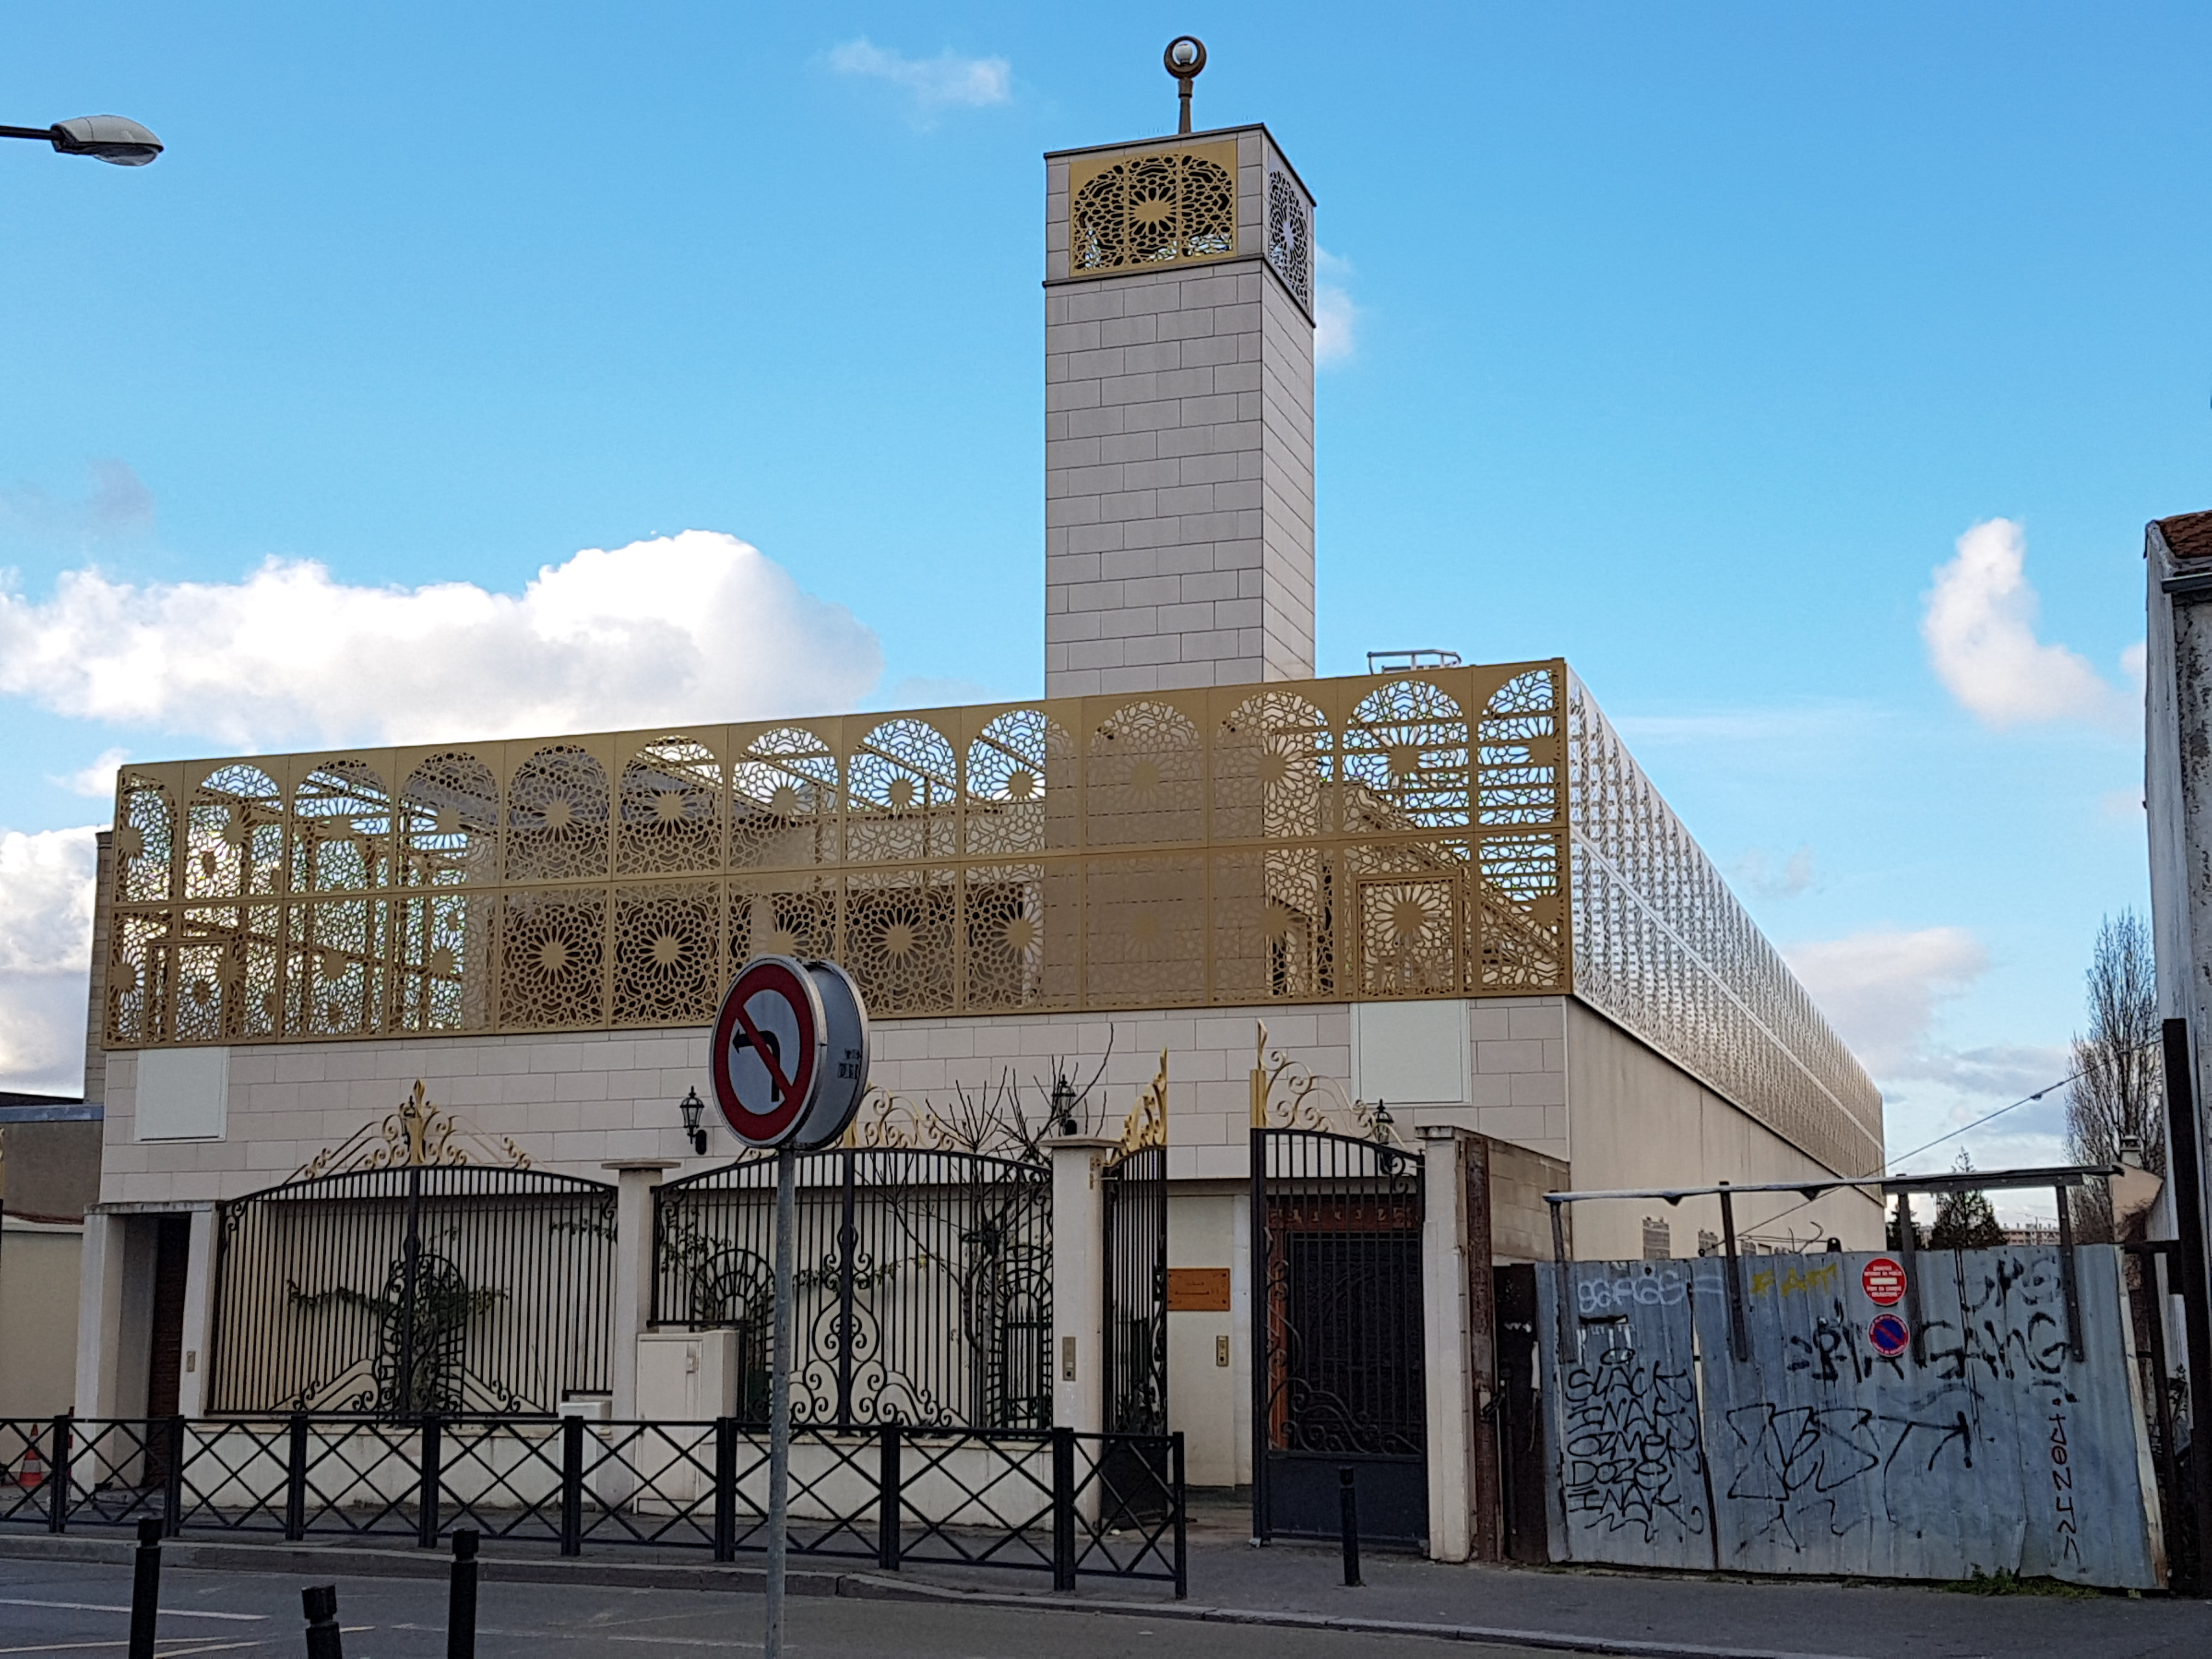 Mosquée Oumma Montreuil